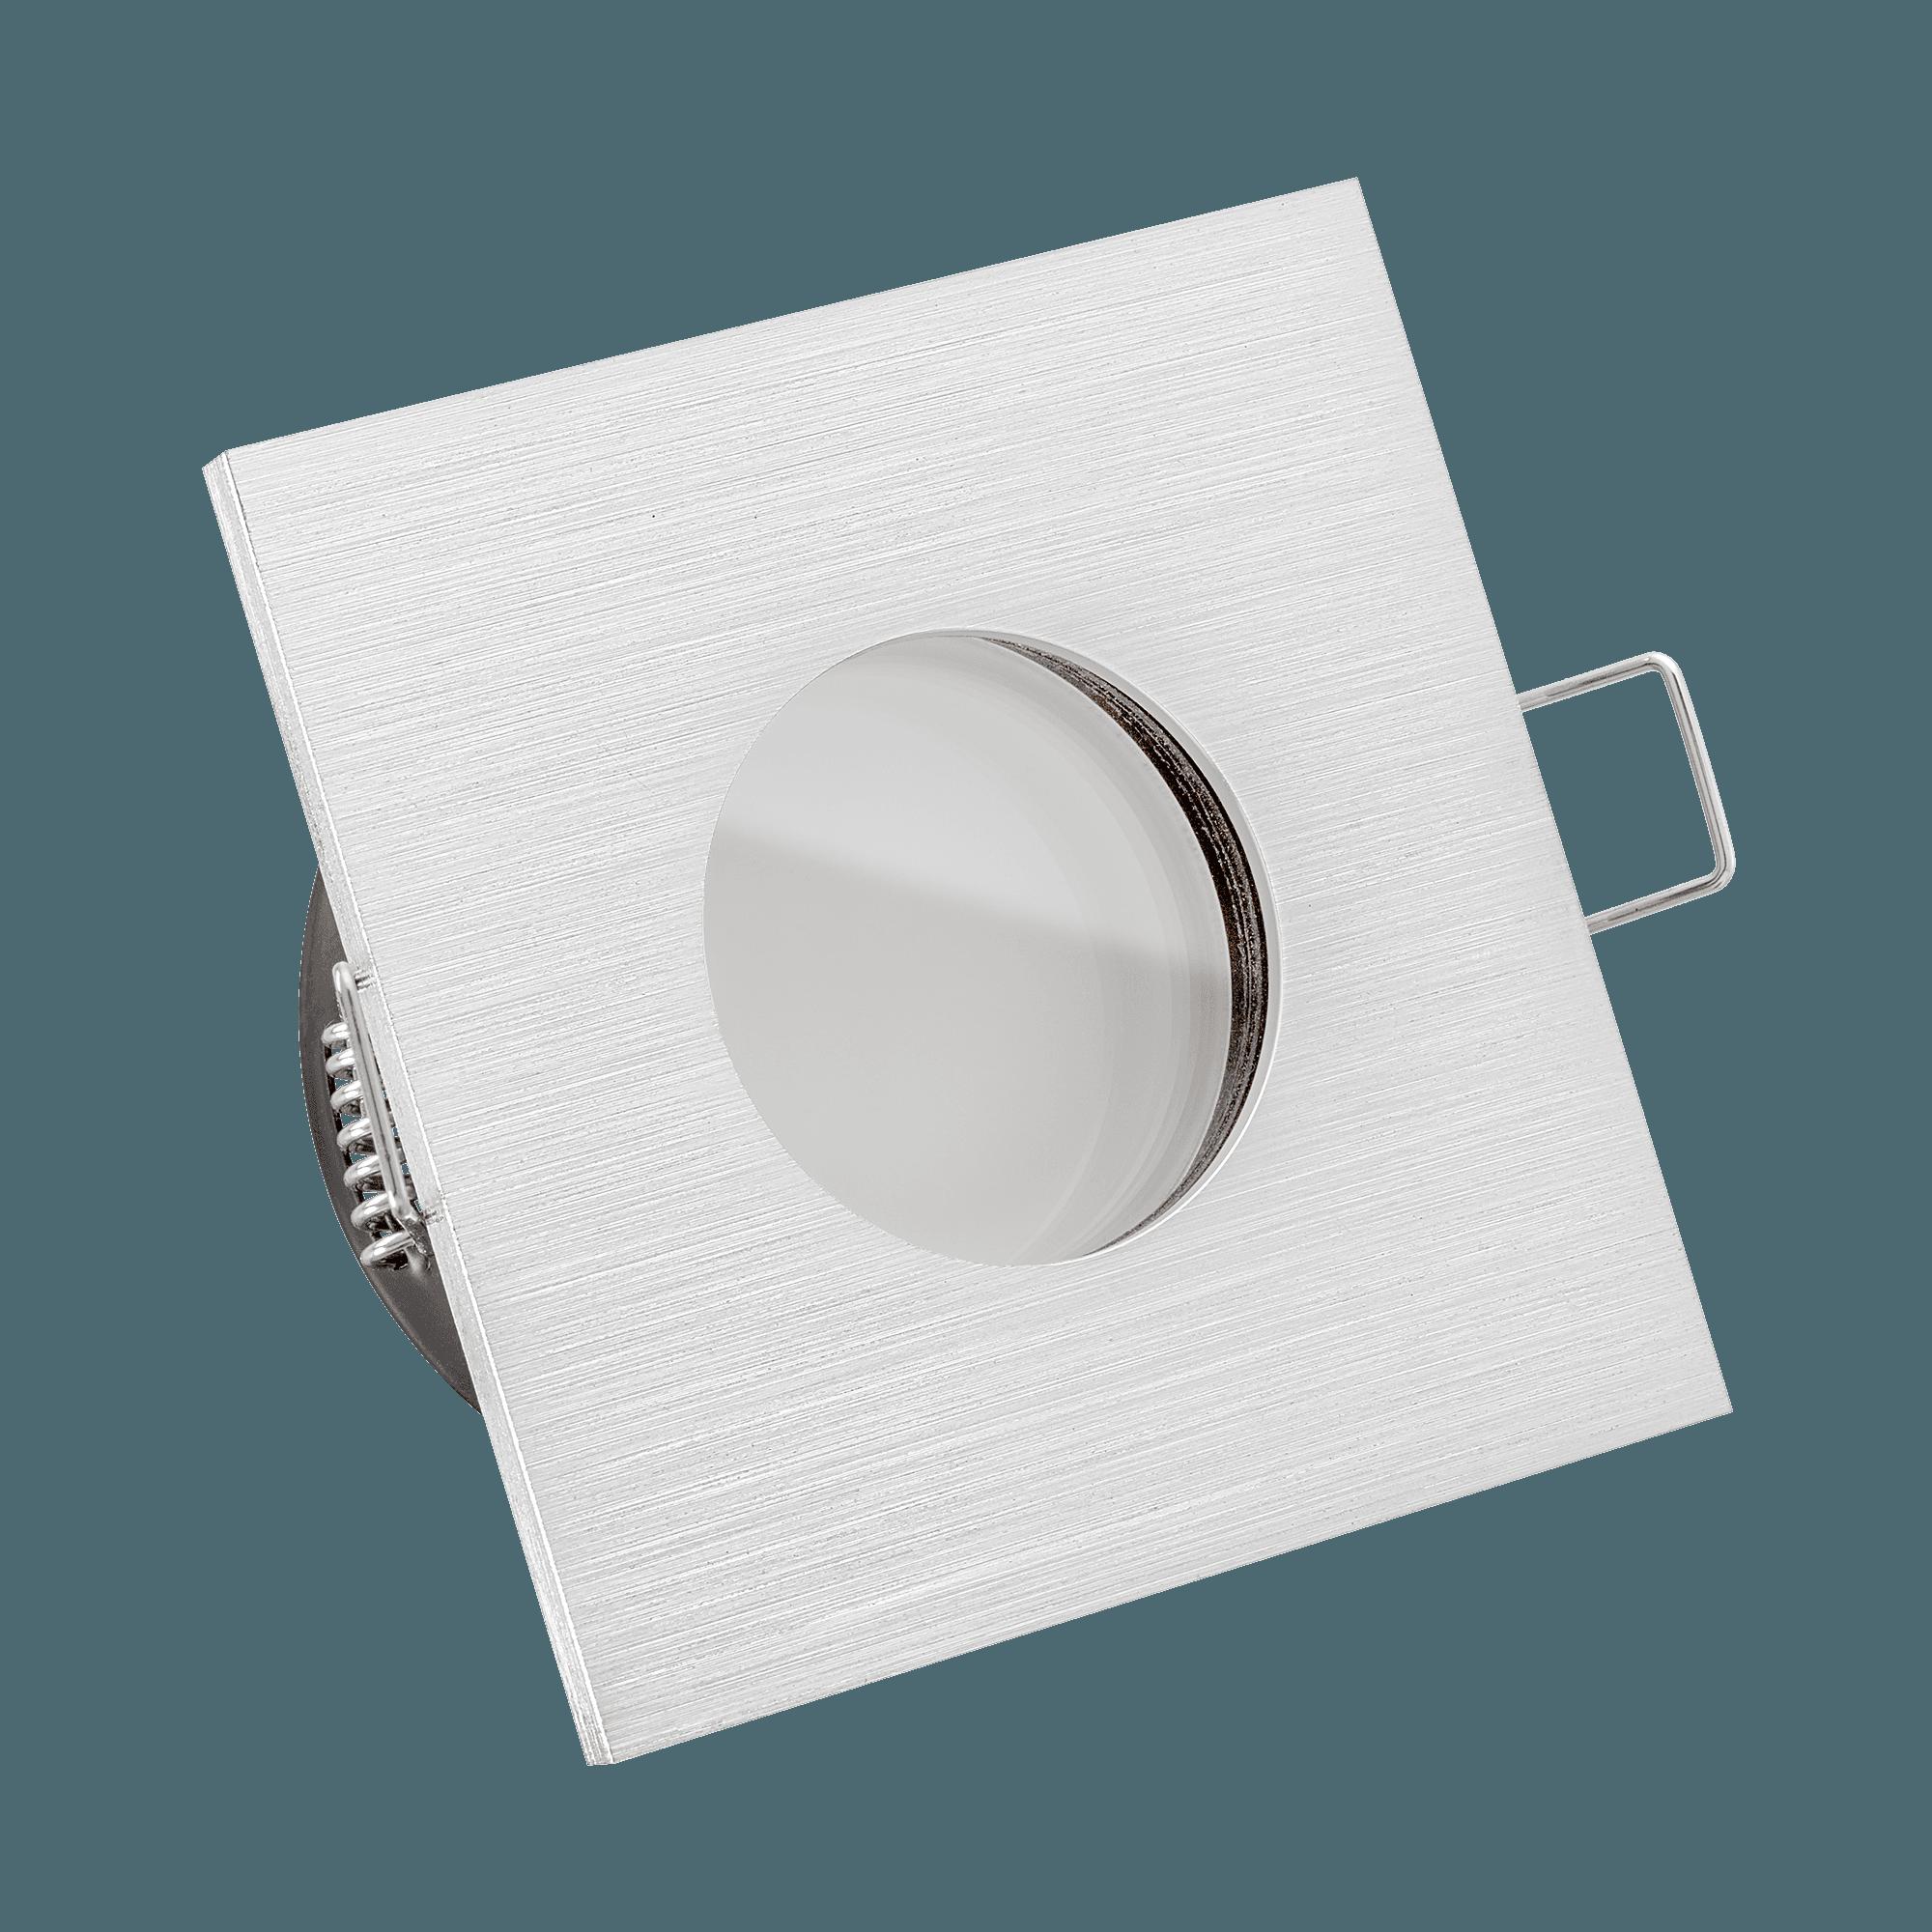 ultra flache lista aqua bad led einbaustrahler 230v nur 35mm flach dimmbar 6w statt 70w. Black Bedroom Furniture Sets. Home Design Ideas